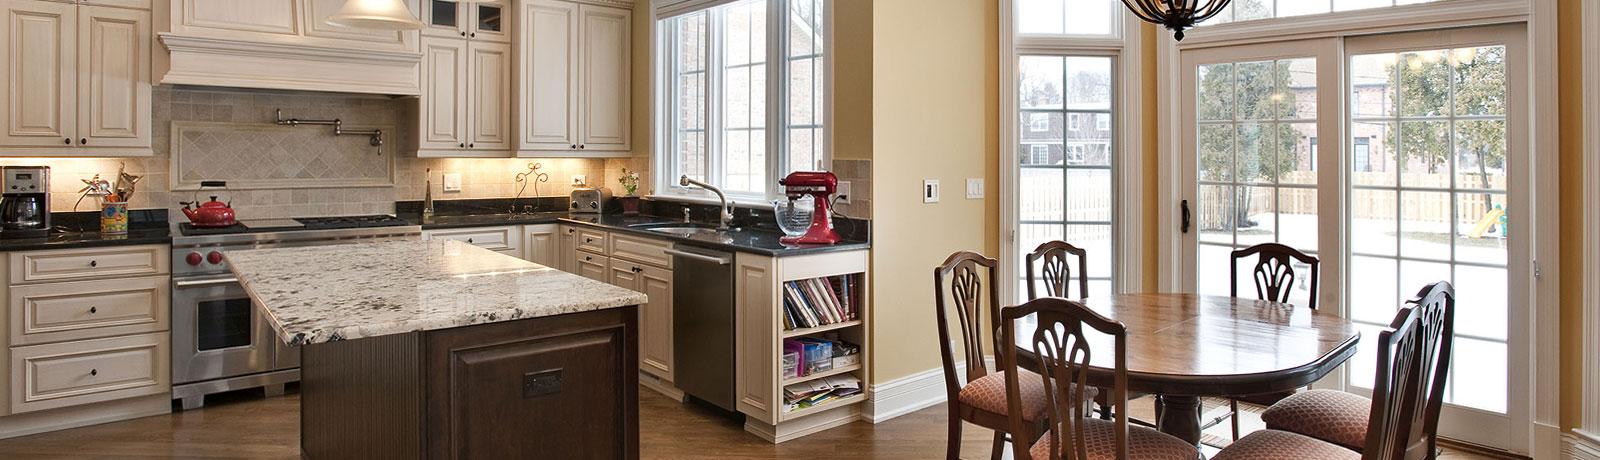 Kitchen Cabinets & Bathroom Vanity Cabinets Advanced Cabinets